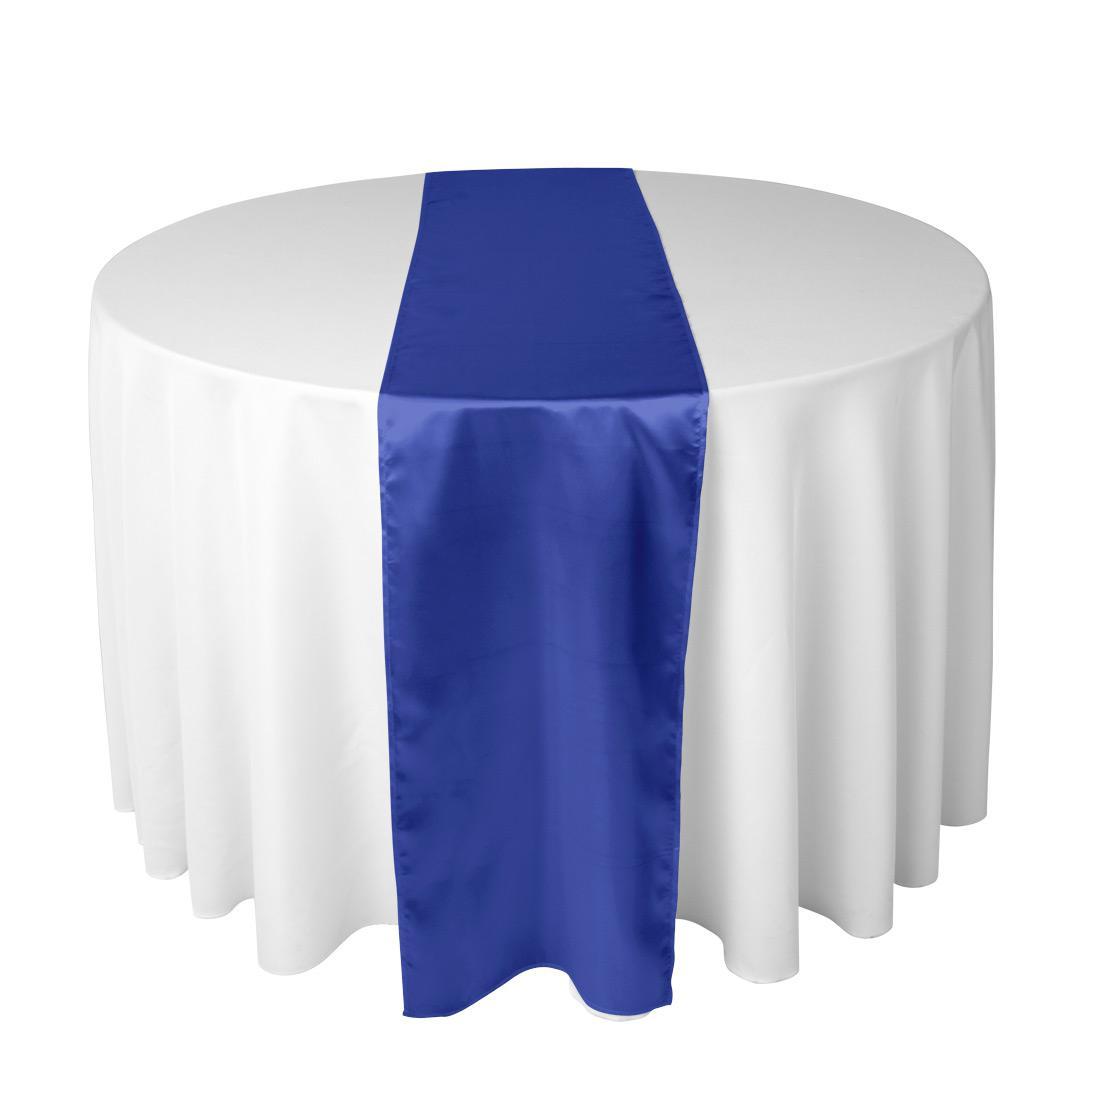 100% Polyester Royal Blue Satin Table Runner For Wedding Reception Or Shower